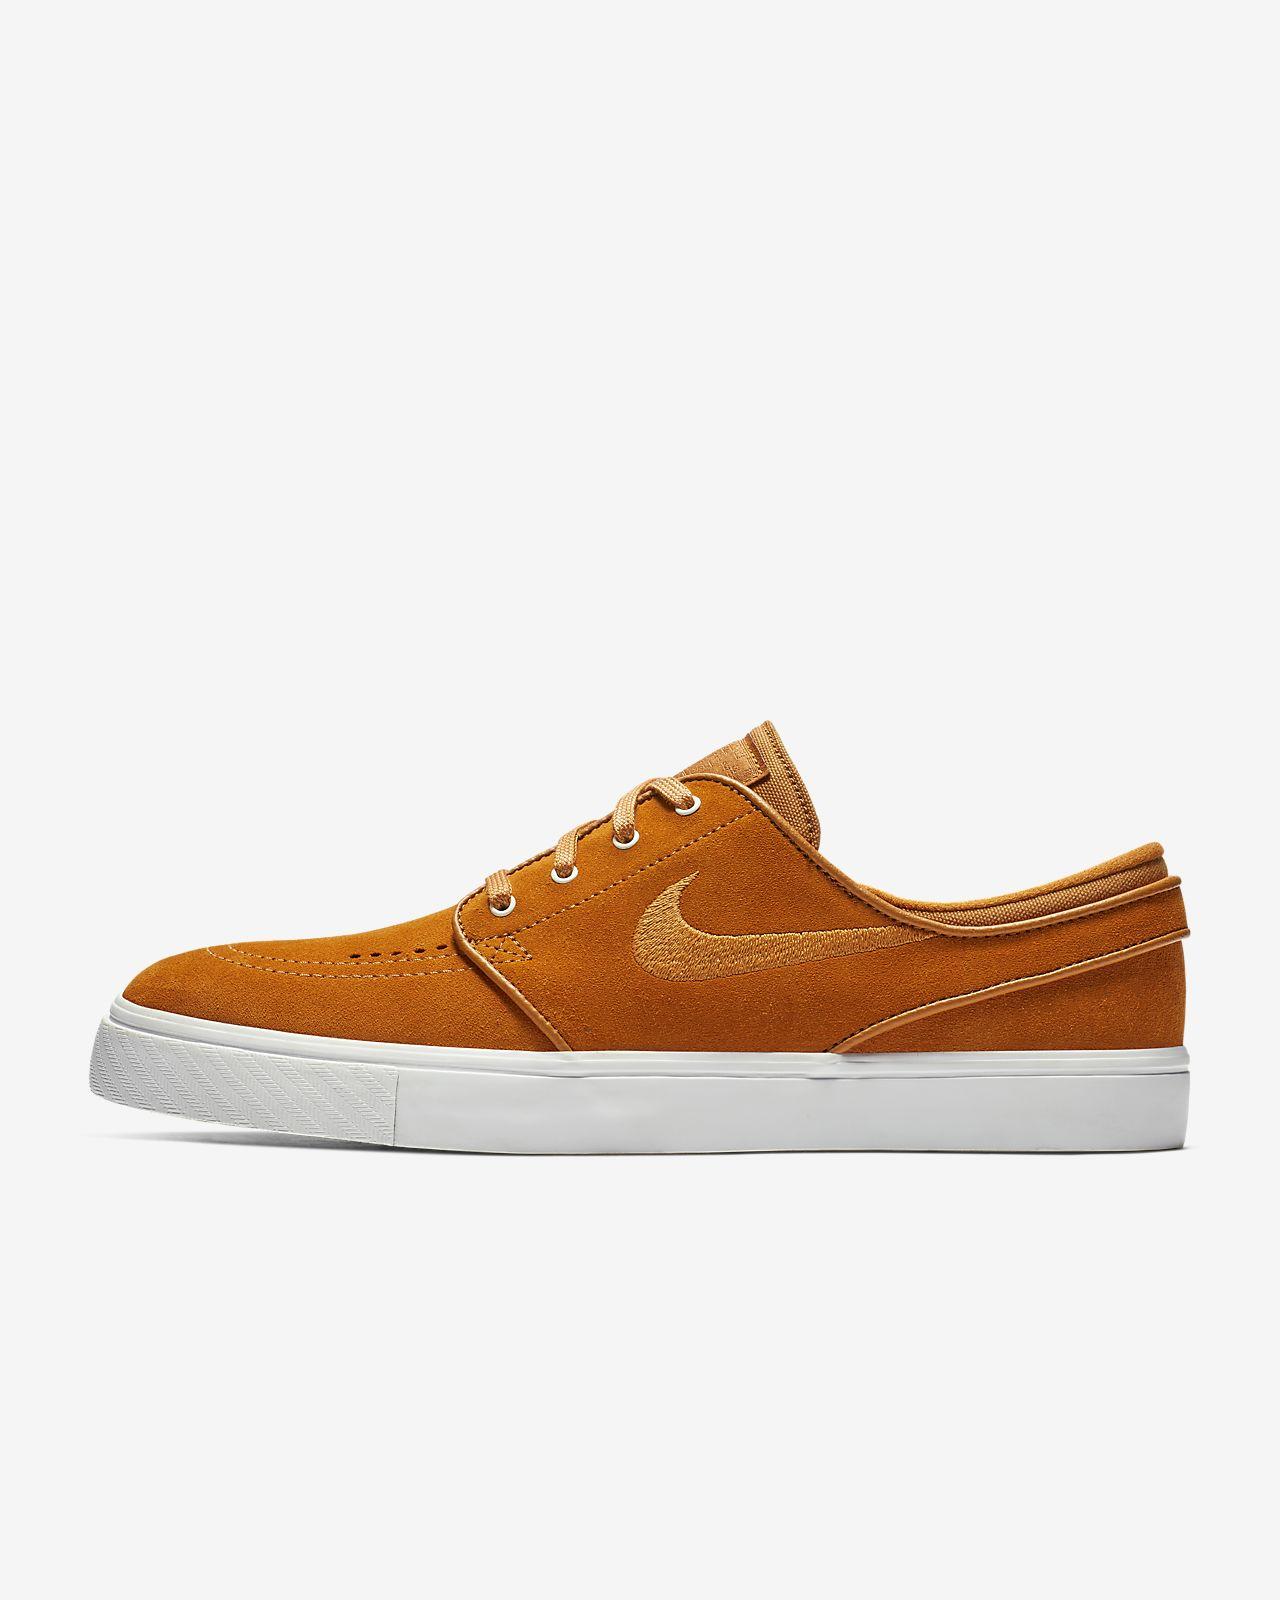 huge selection of 7e238 c65a2 Chaussure de skateboard Nike Zoom Stefan Janoski pour Homme. Nike.com BE